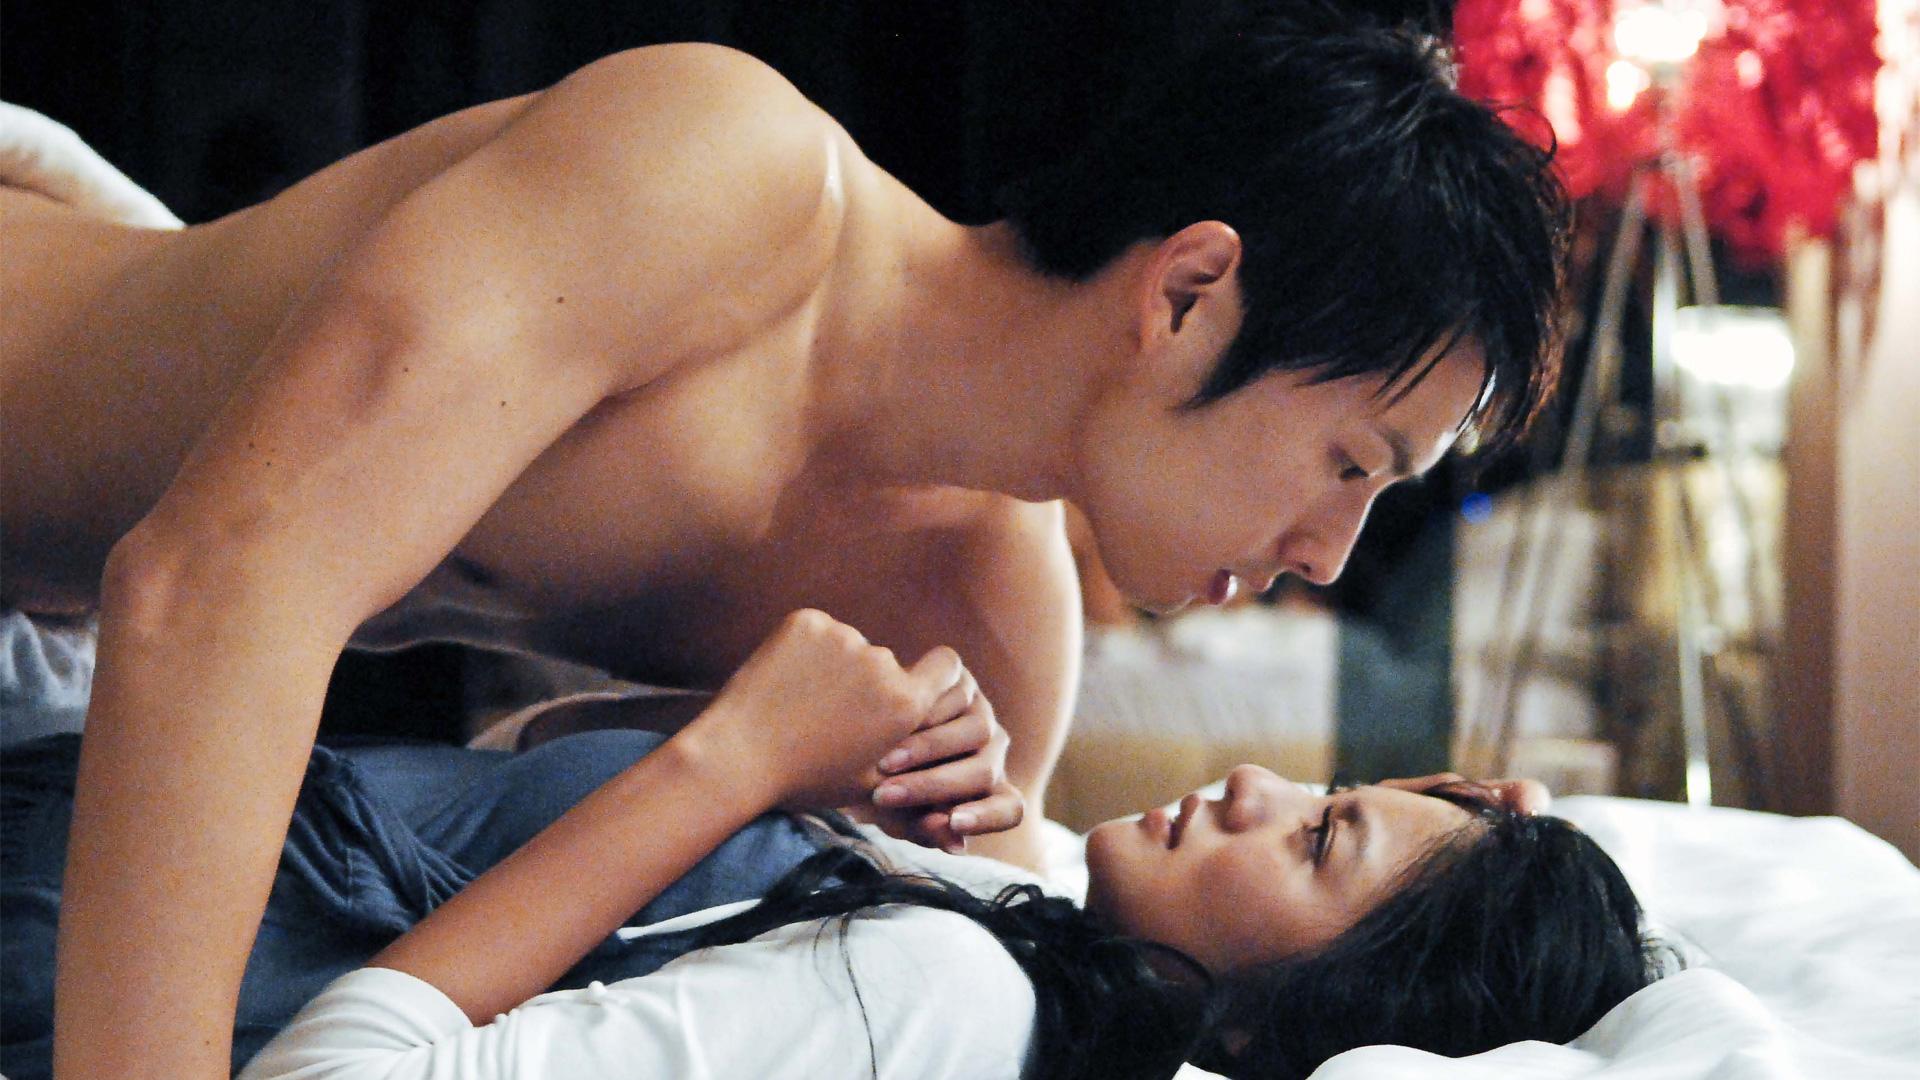 Nude image yougalery korean